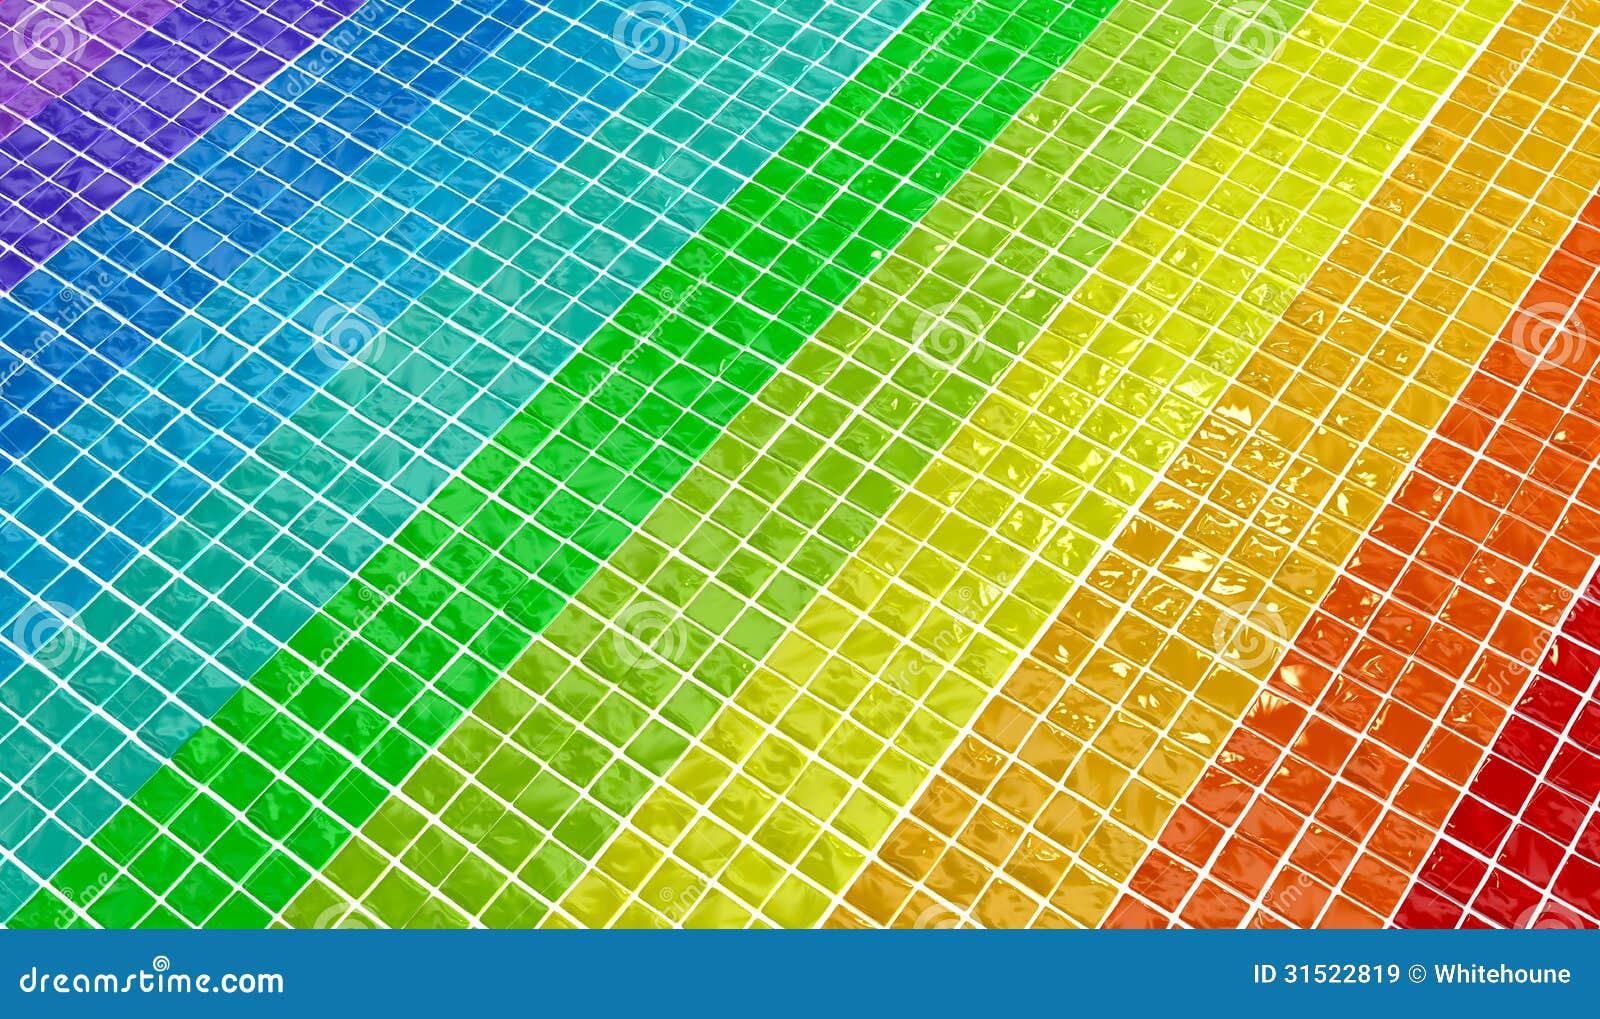 Ceramic tiles background stock illustration. Illustration of ...